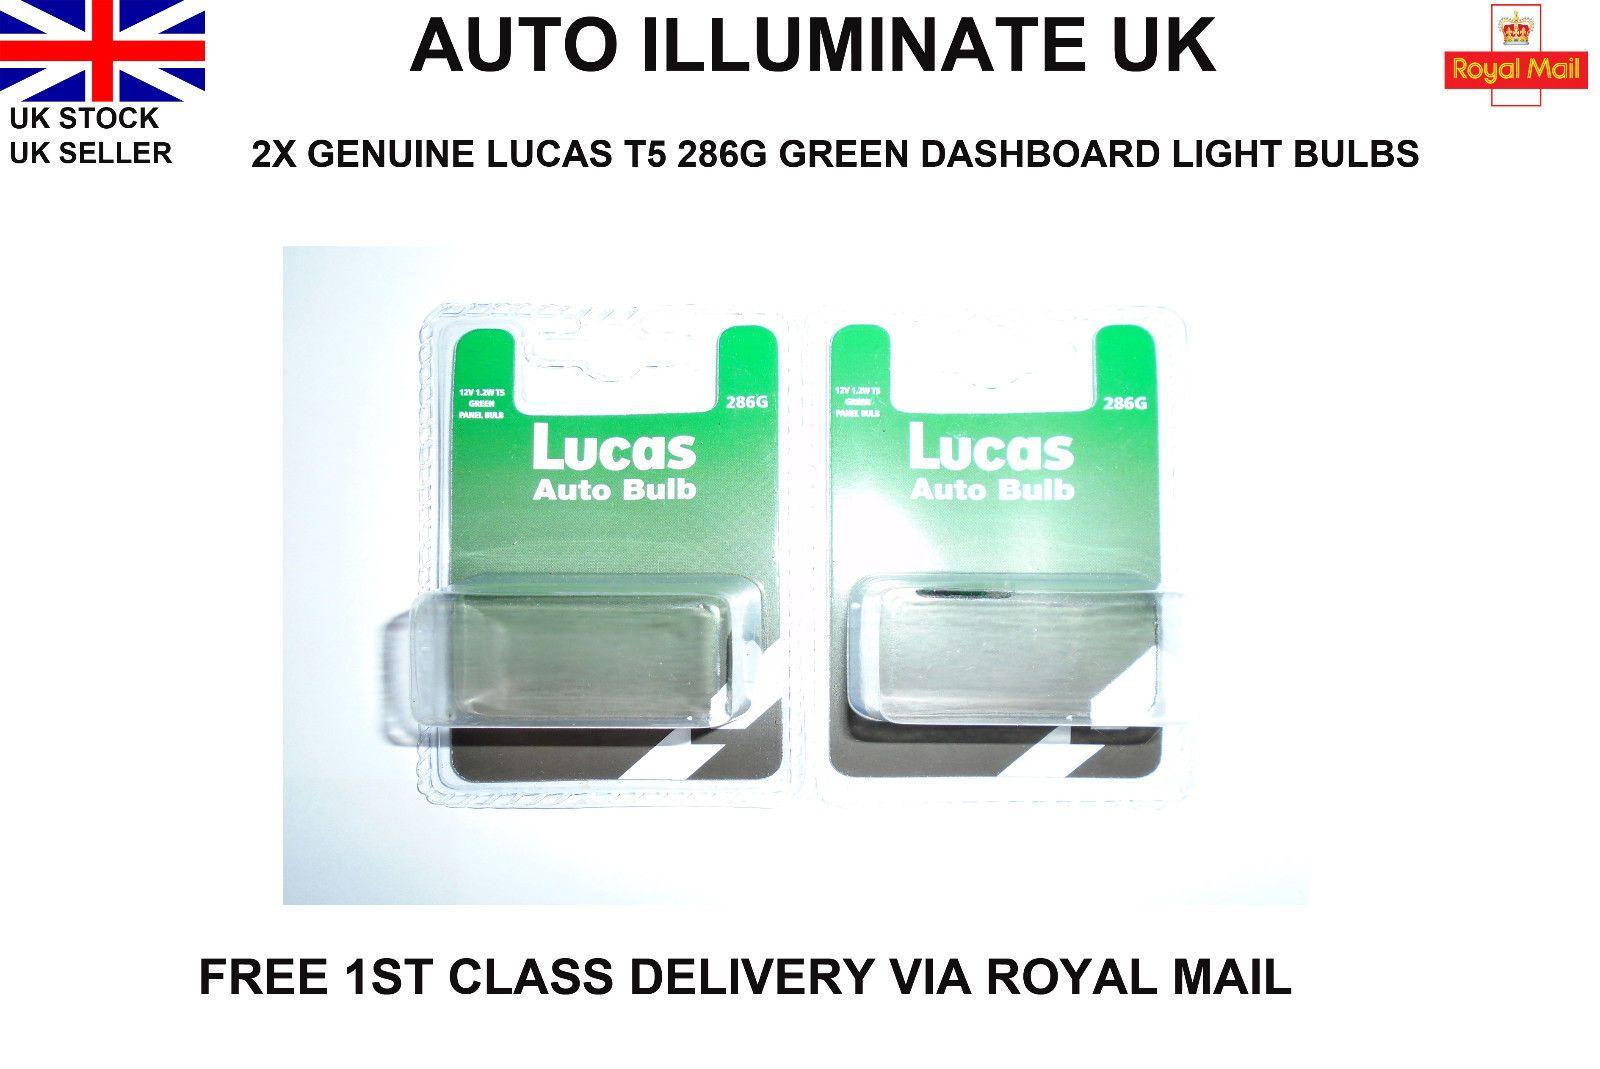 LUCAS T5 286 RED CAR INSTRUMENT PANEL SPEEDO GAUGES LIGHT BULBS LAMPS 12V 1.2W